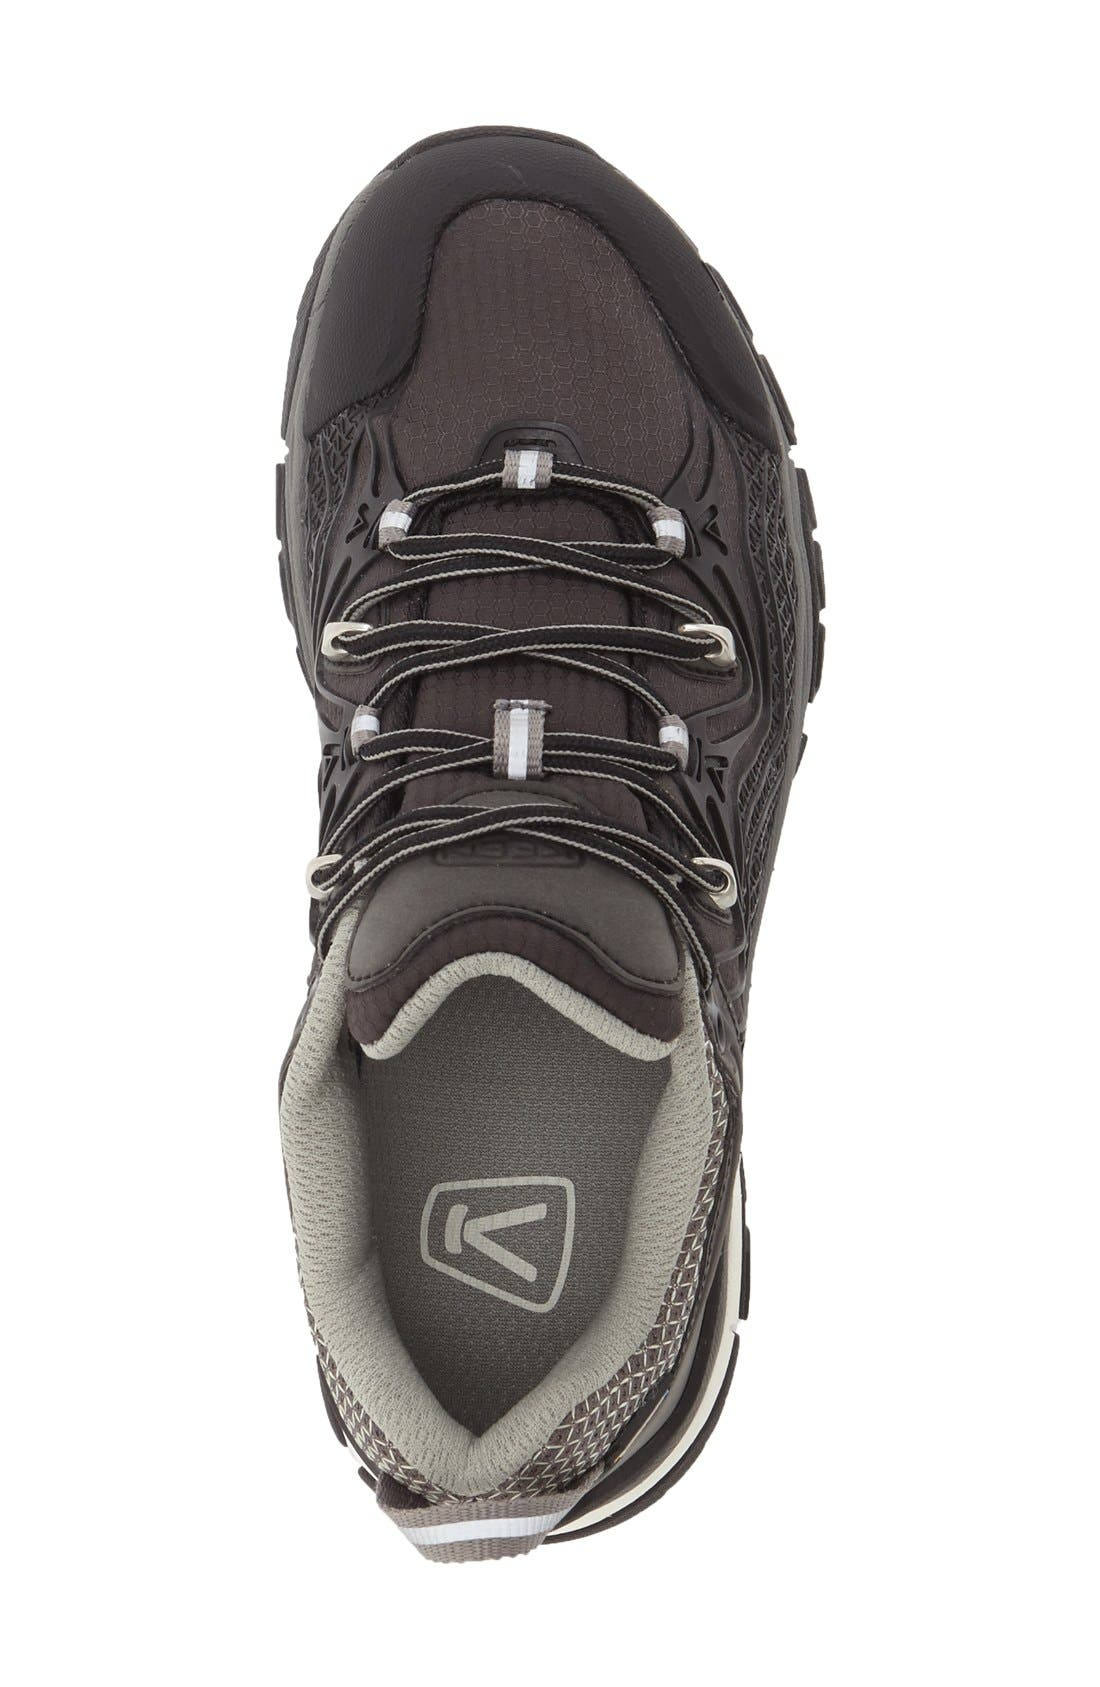 Alternate Image 3  - Keen 'Aphlex' Waterproof Hiking Boot (Women)